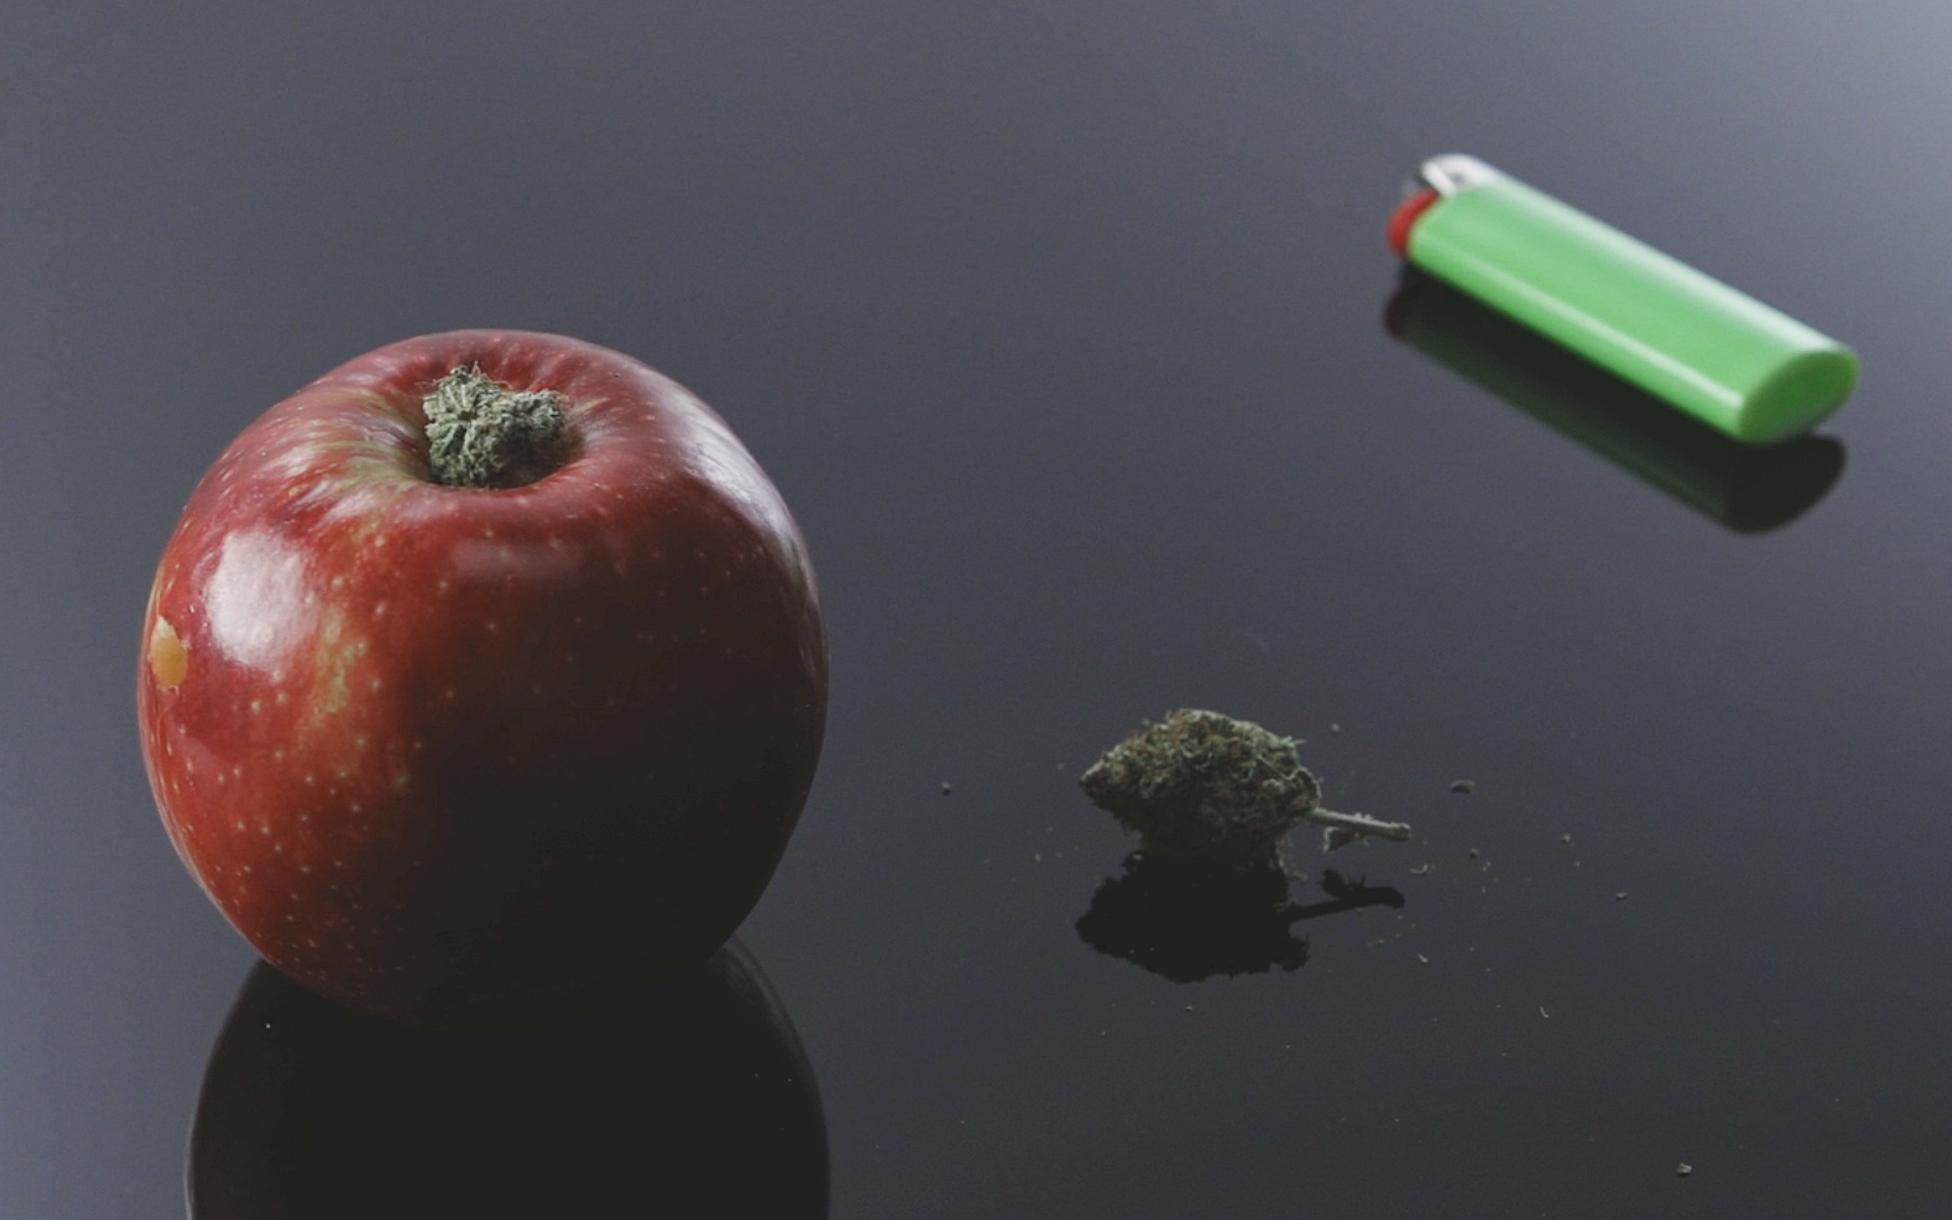 Apple Pipe Weed